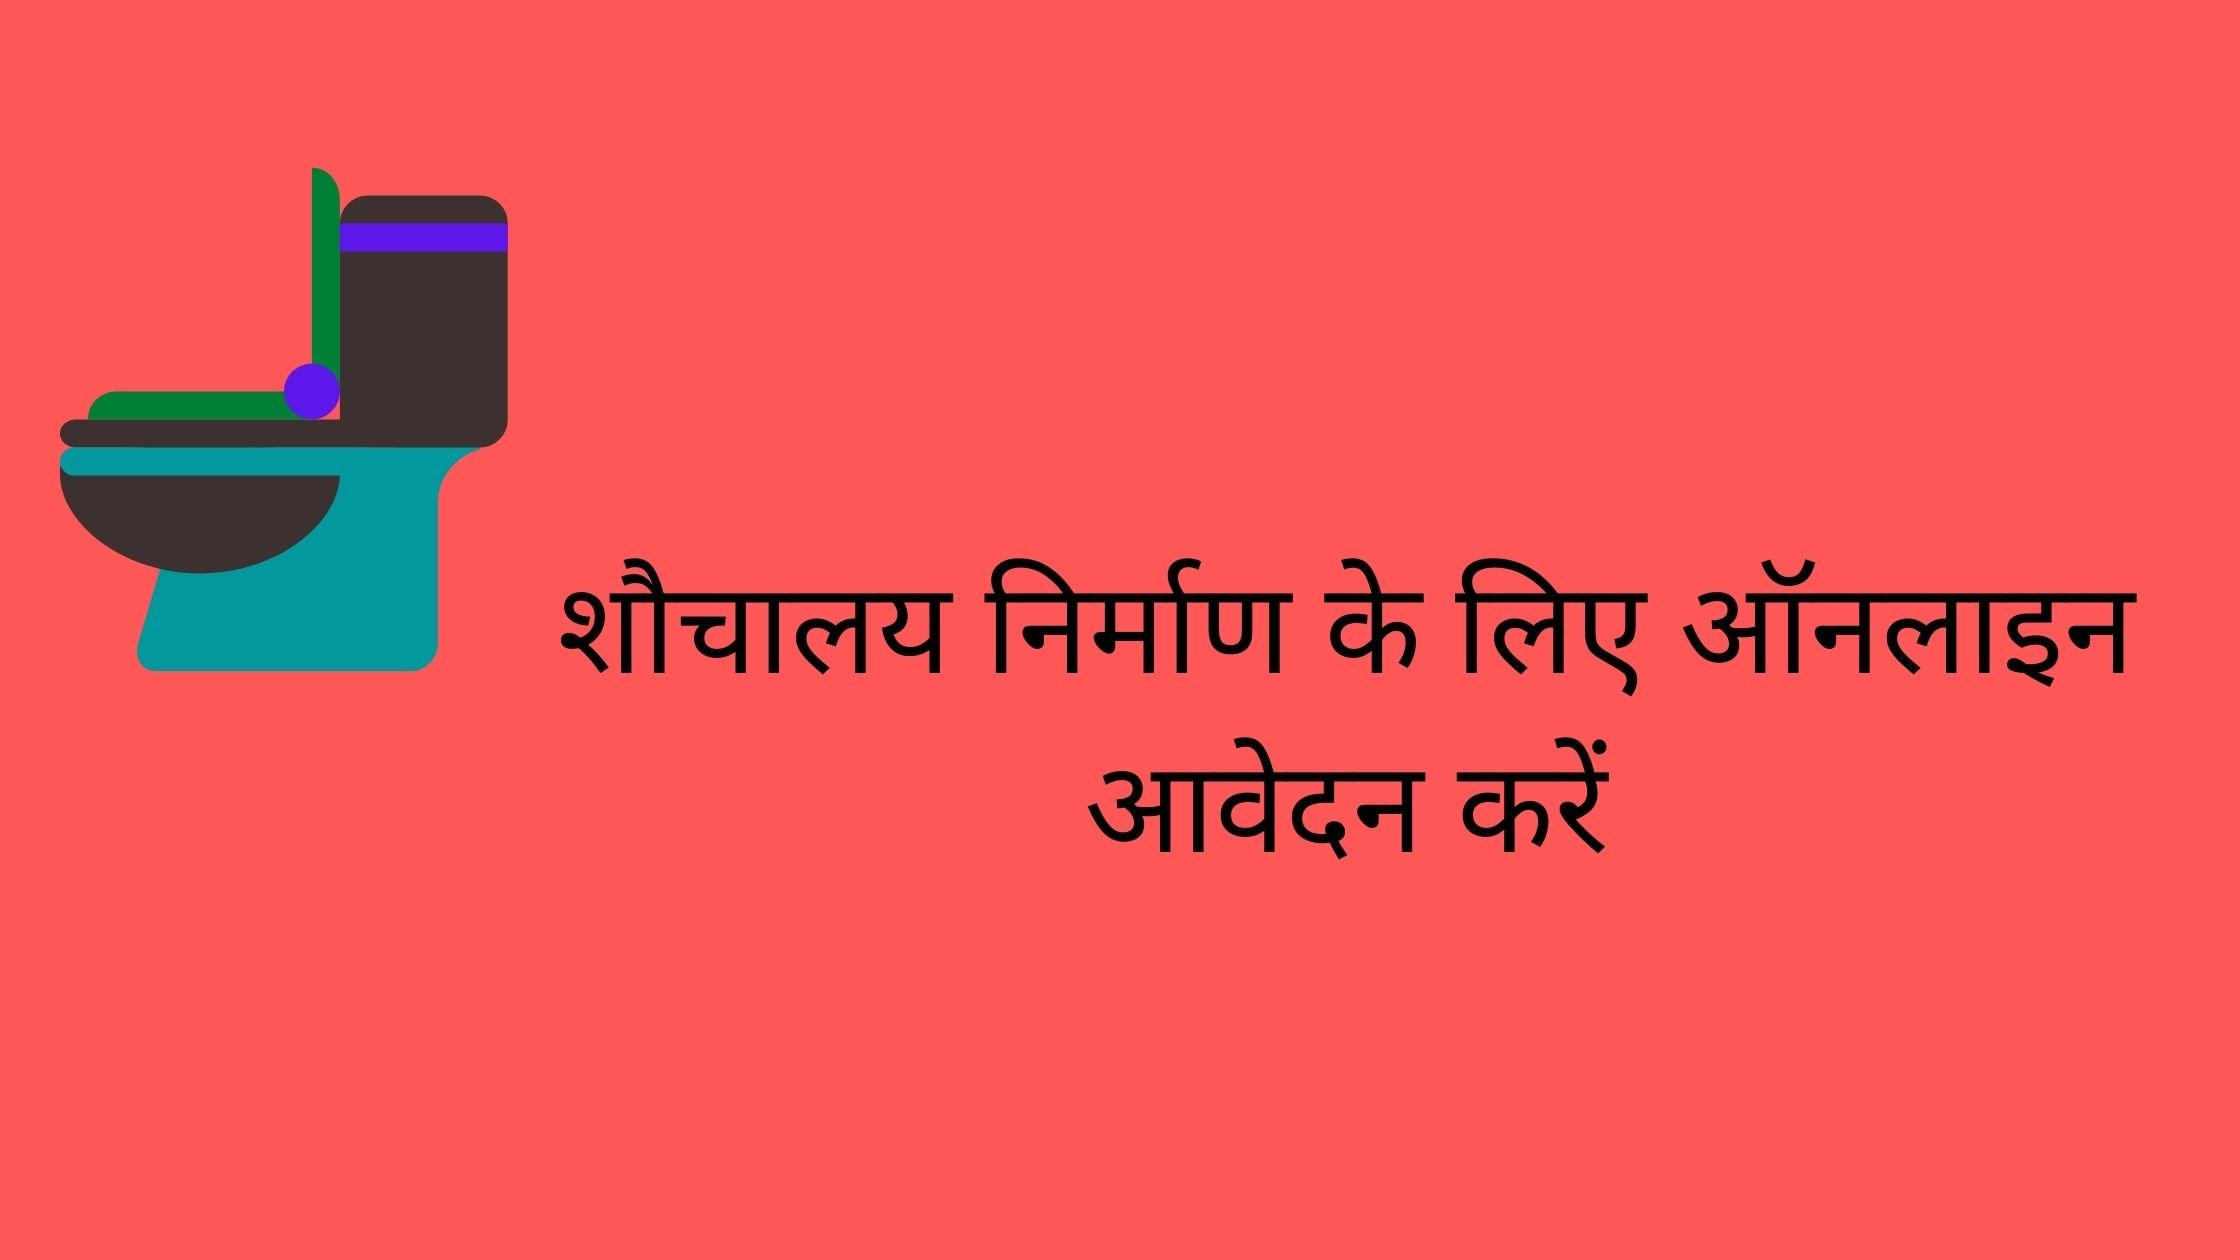 शौचालय योजना ऑनलाइन फॉर्म आवेदन 2021 – Pradhan Mantri Sochalay Yojana List & 2021